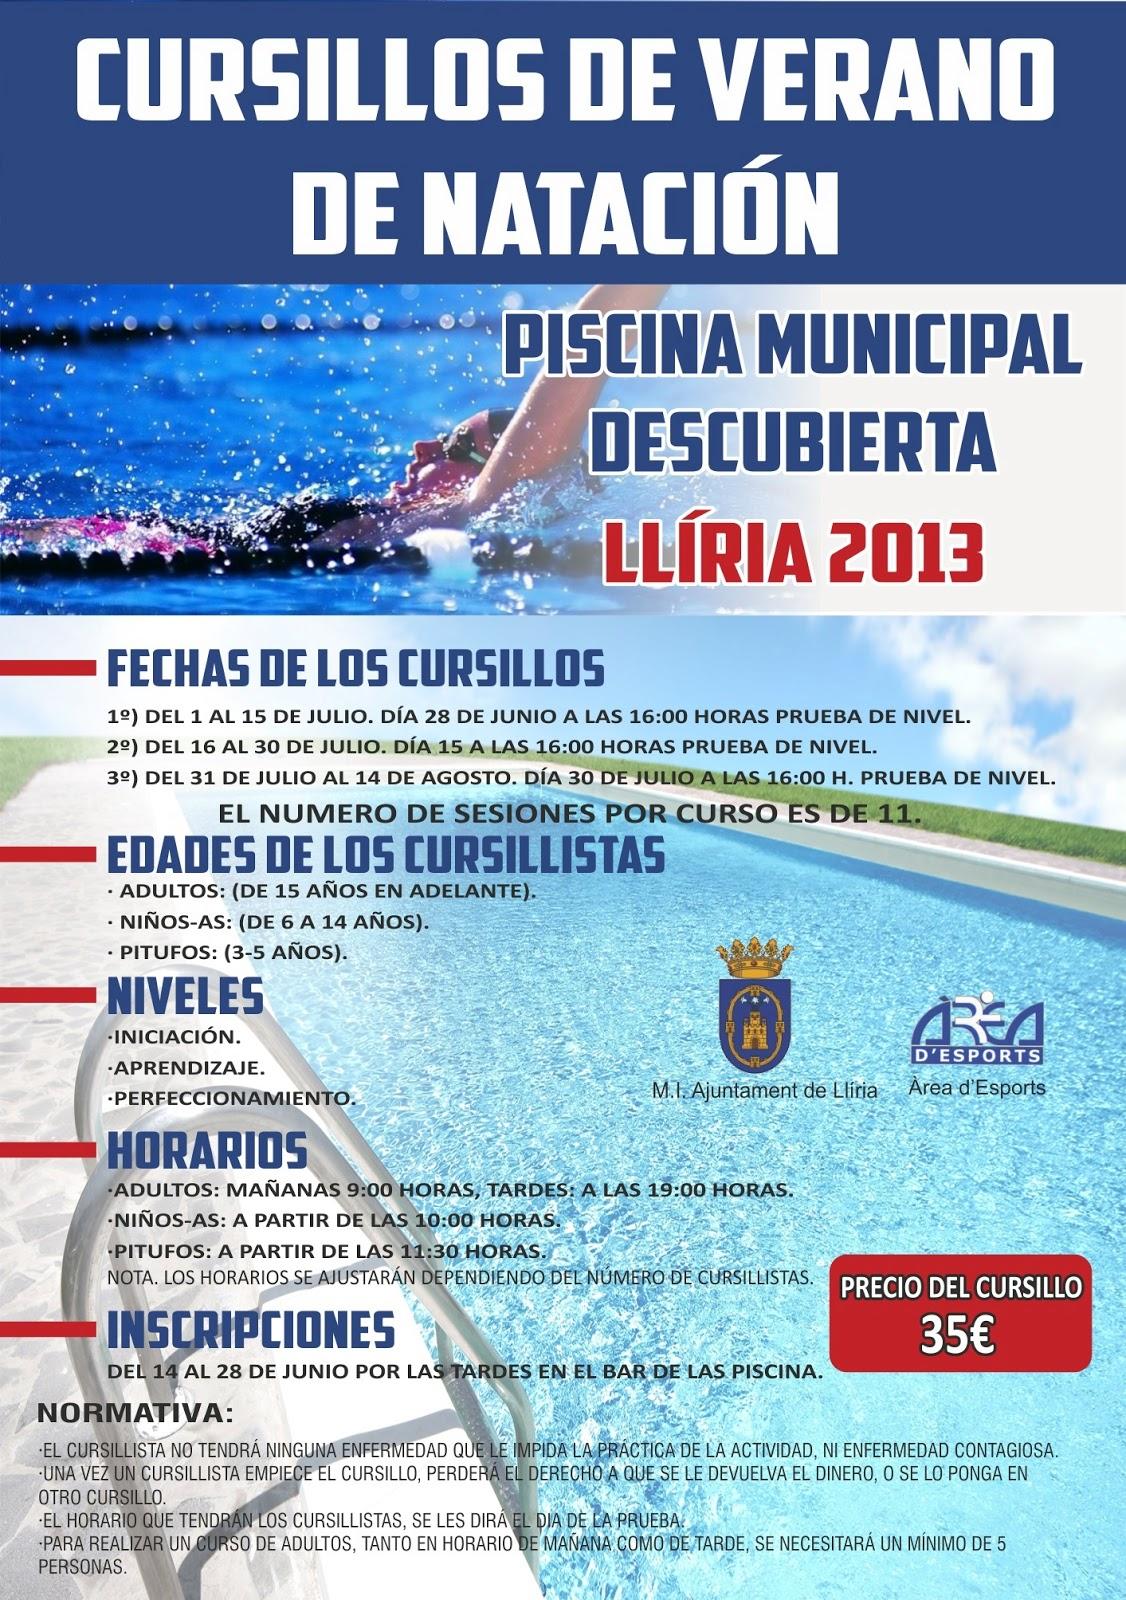 Esport lliria mayo 2013 for Piscina municipal lliria